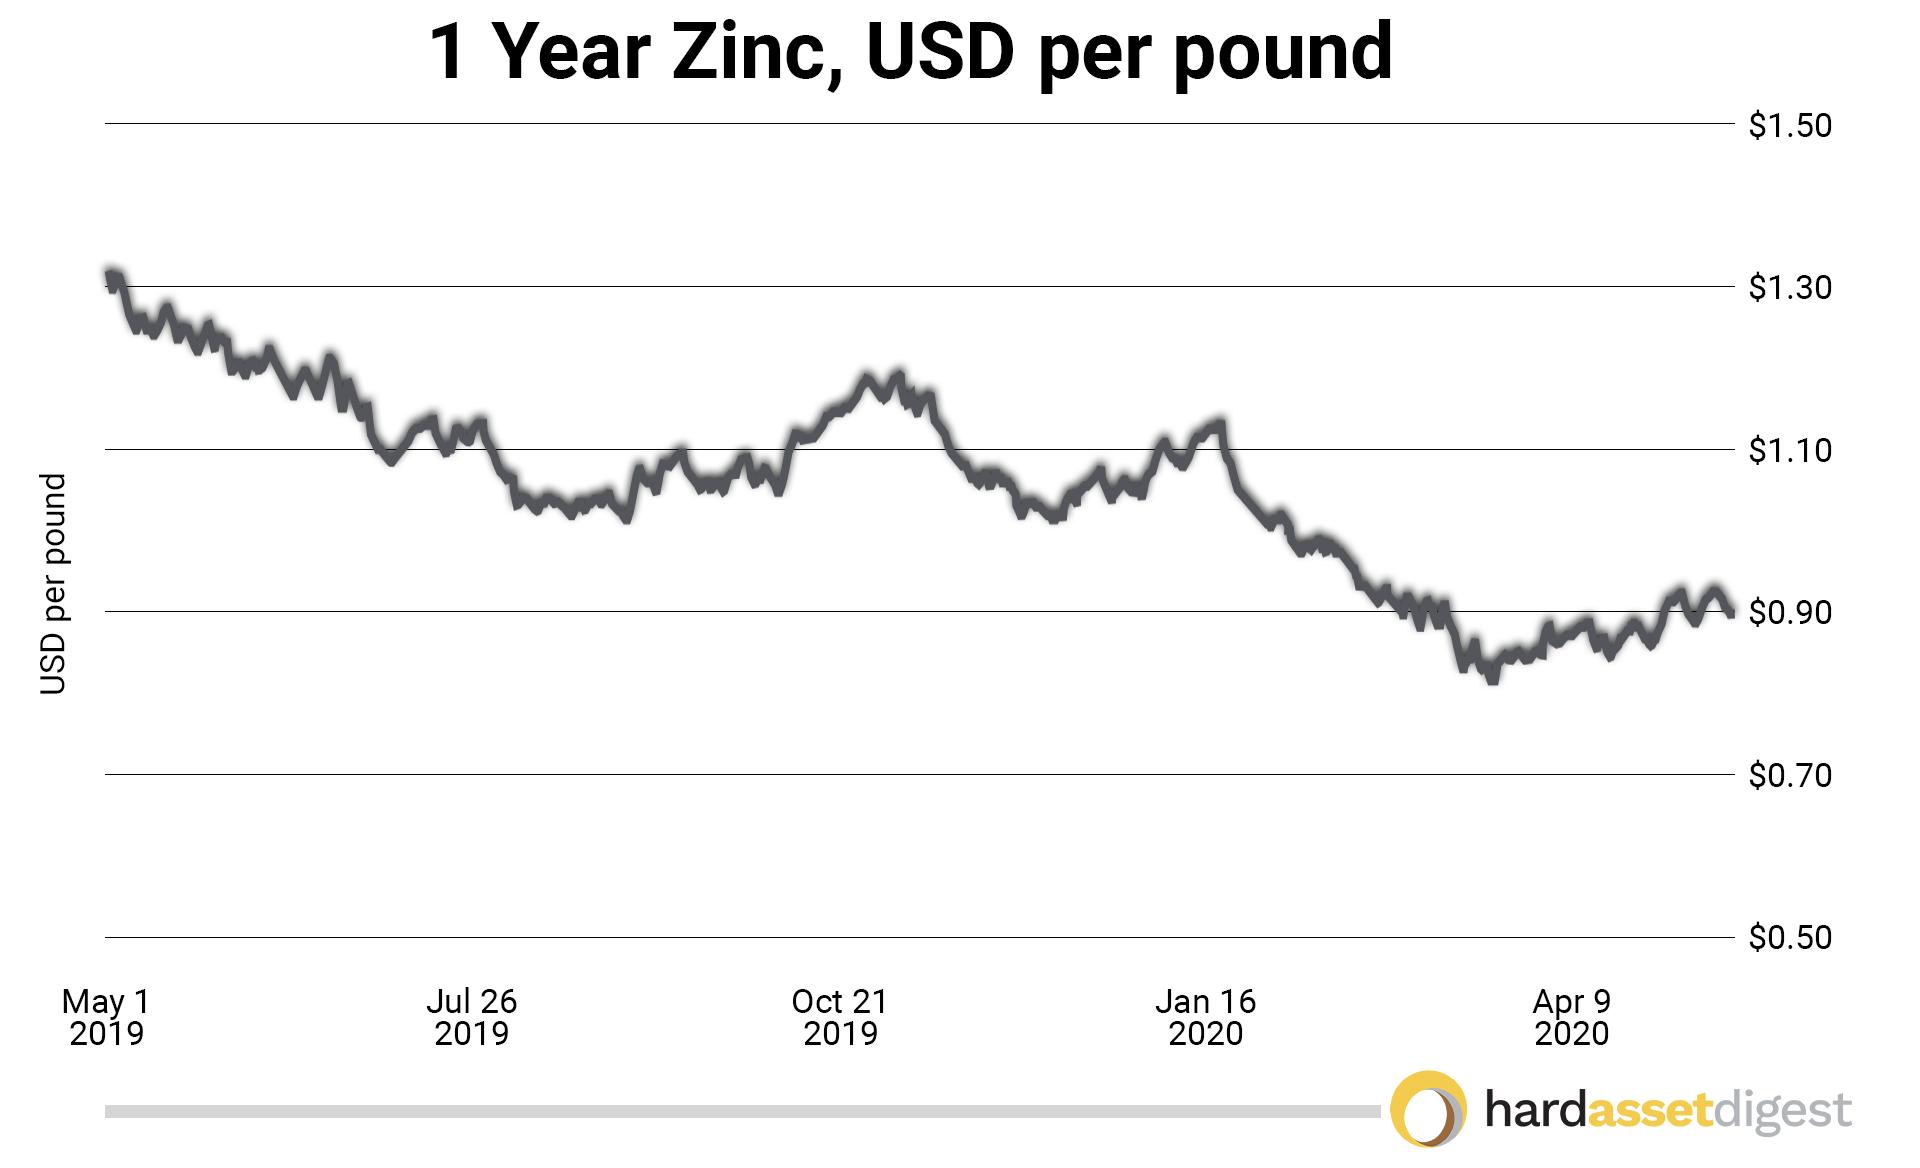 1year-zinc-usd-per-pound